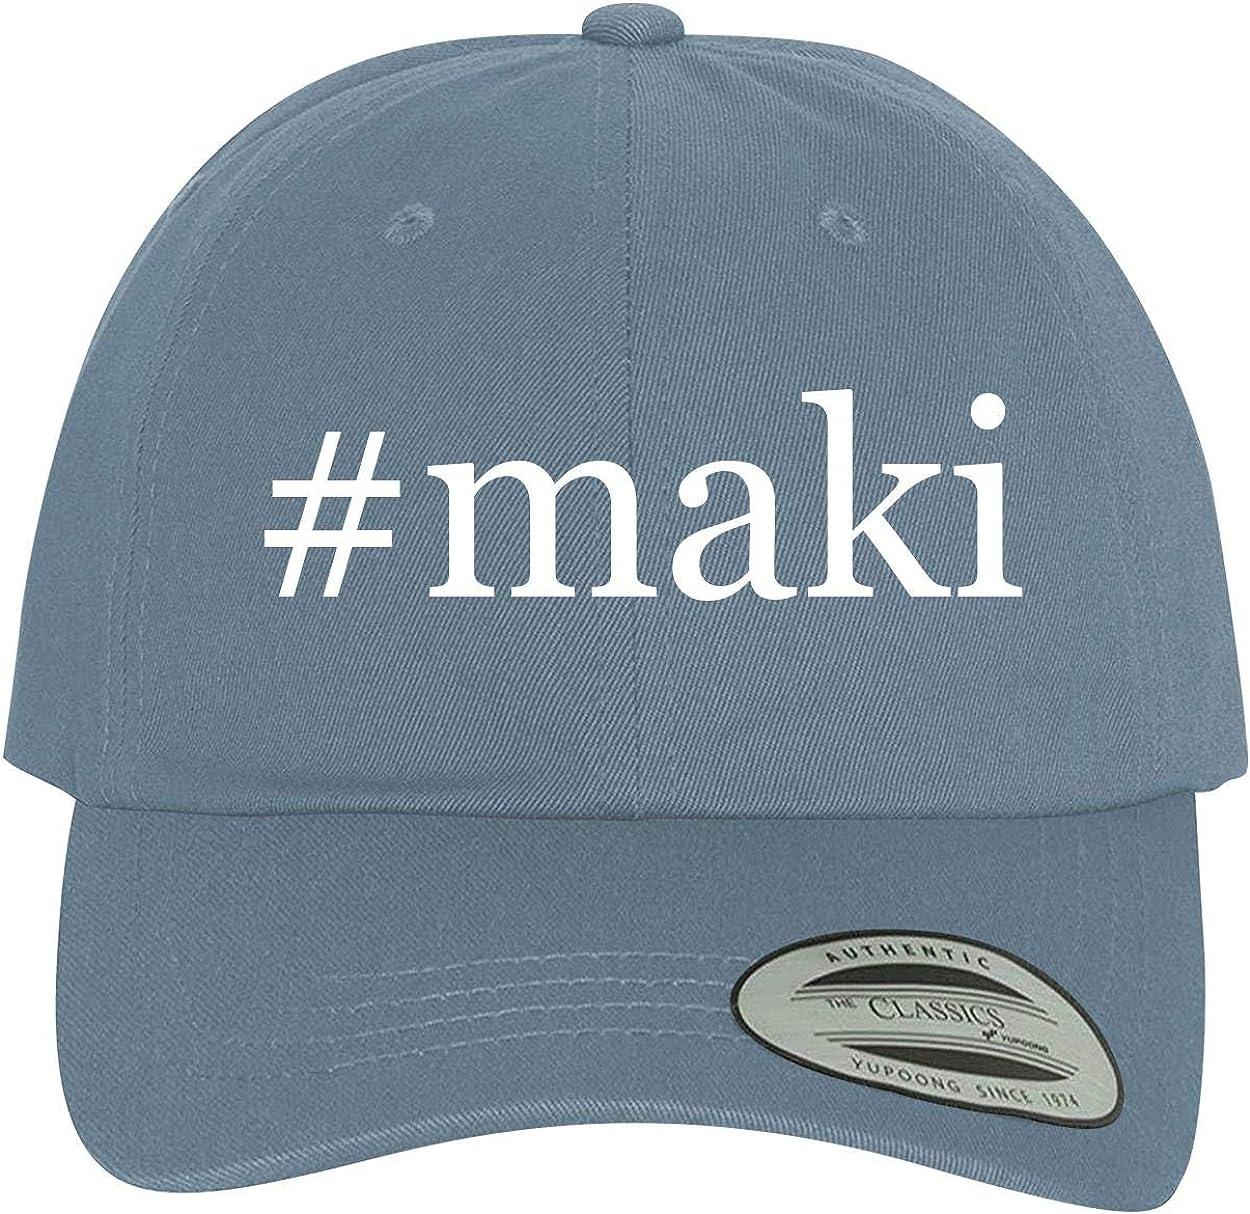 Comfortable Dad Hat Baseball Cap BH Cool Designs #Maki